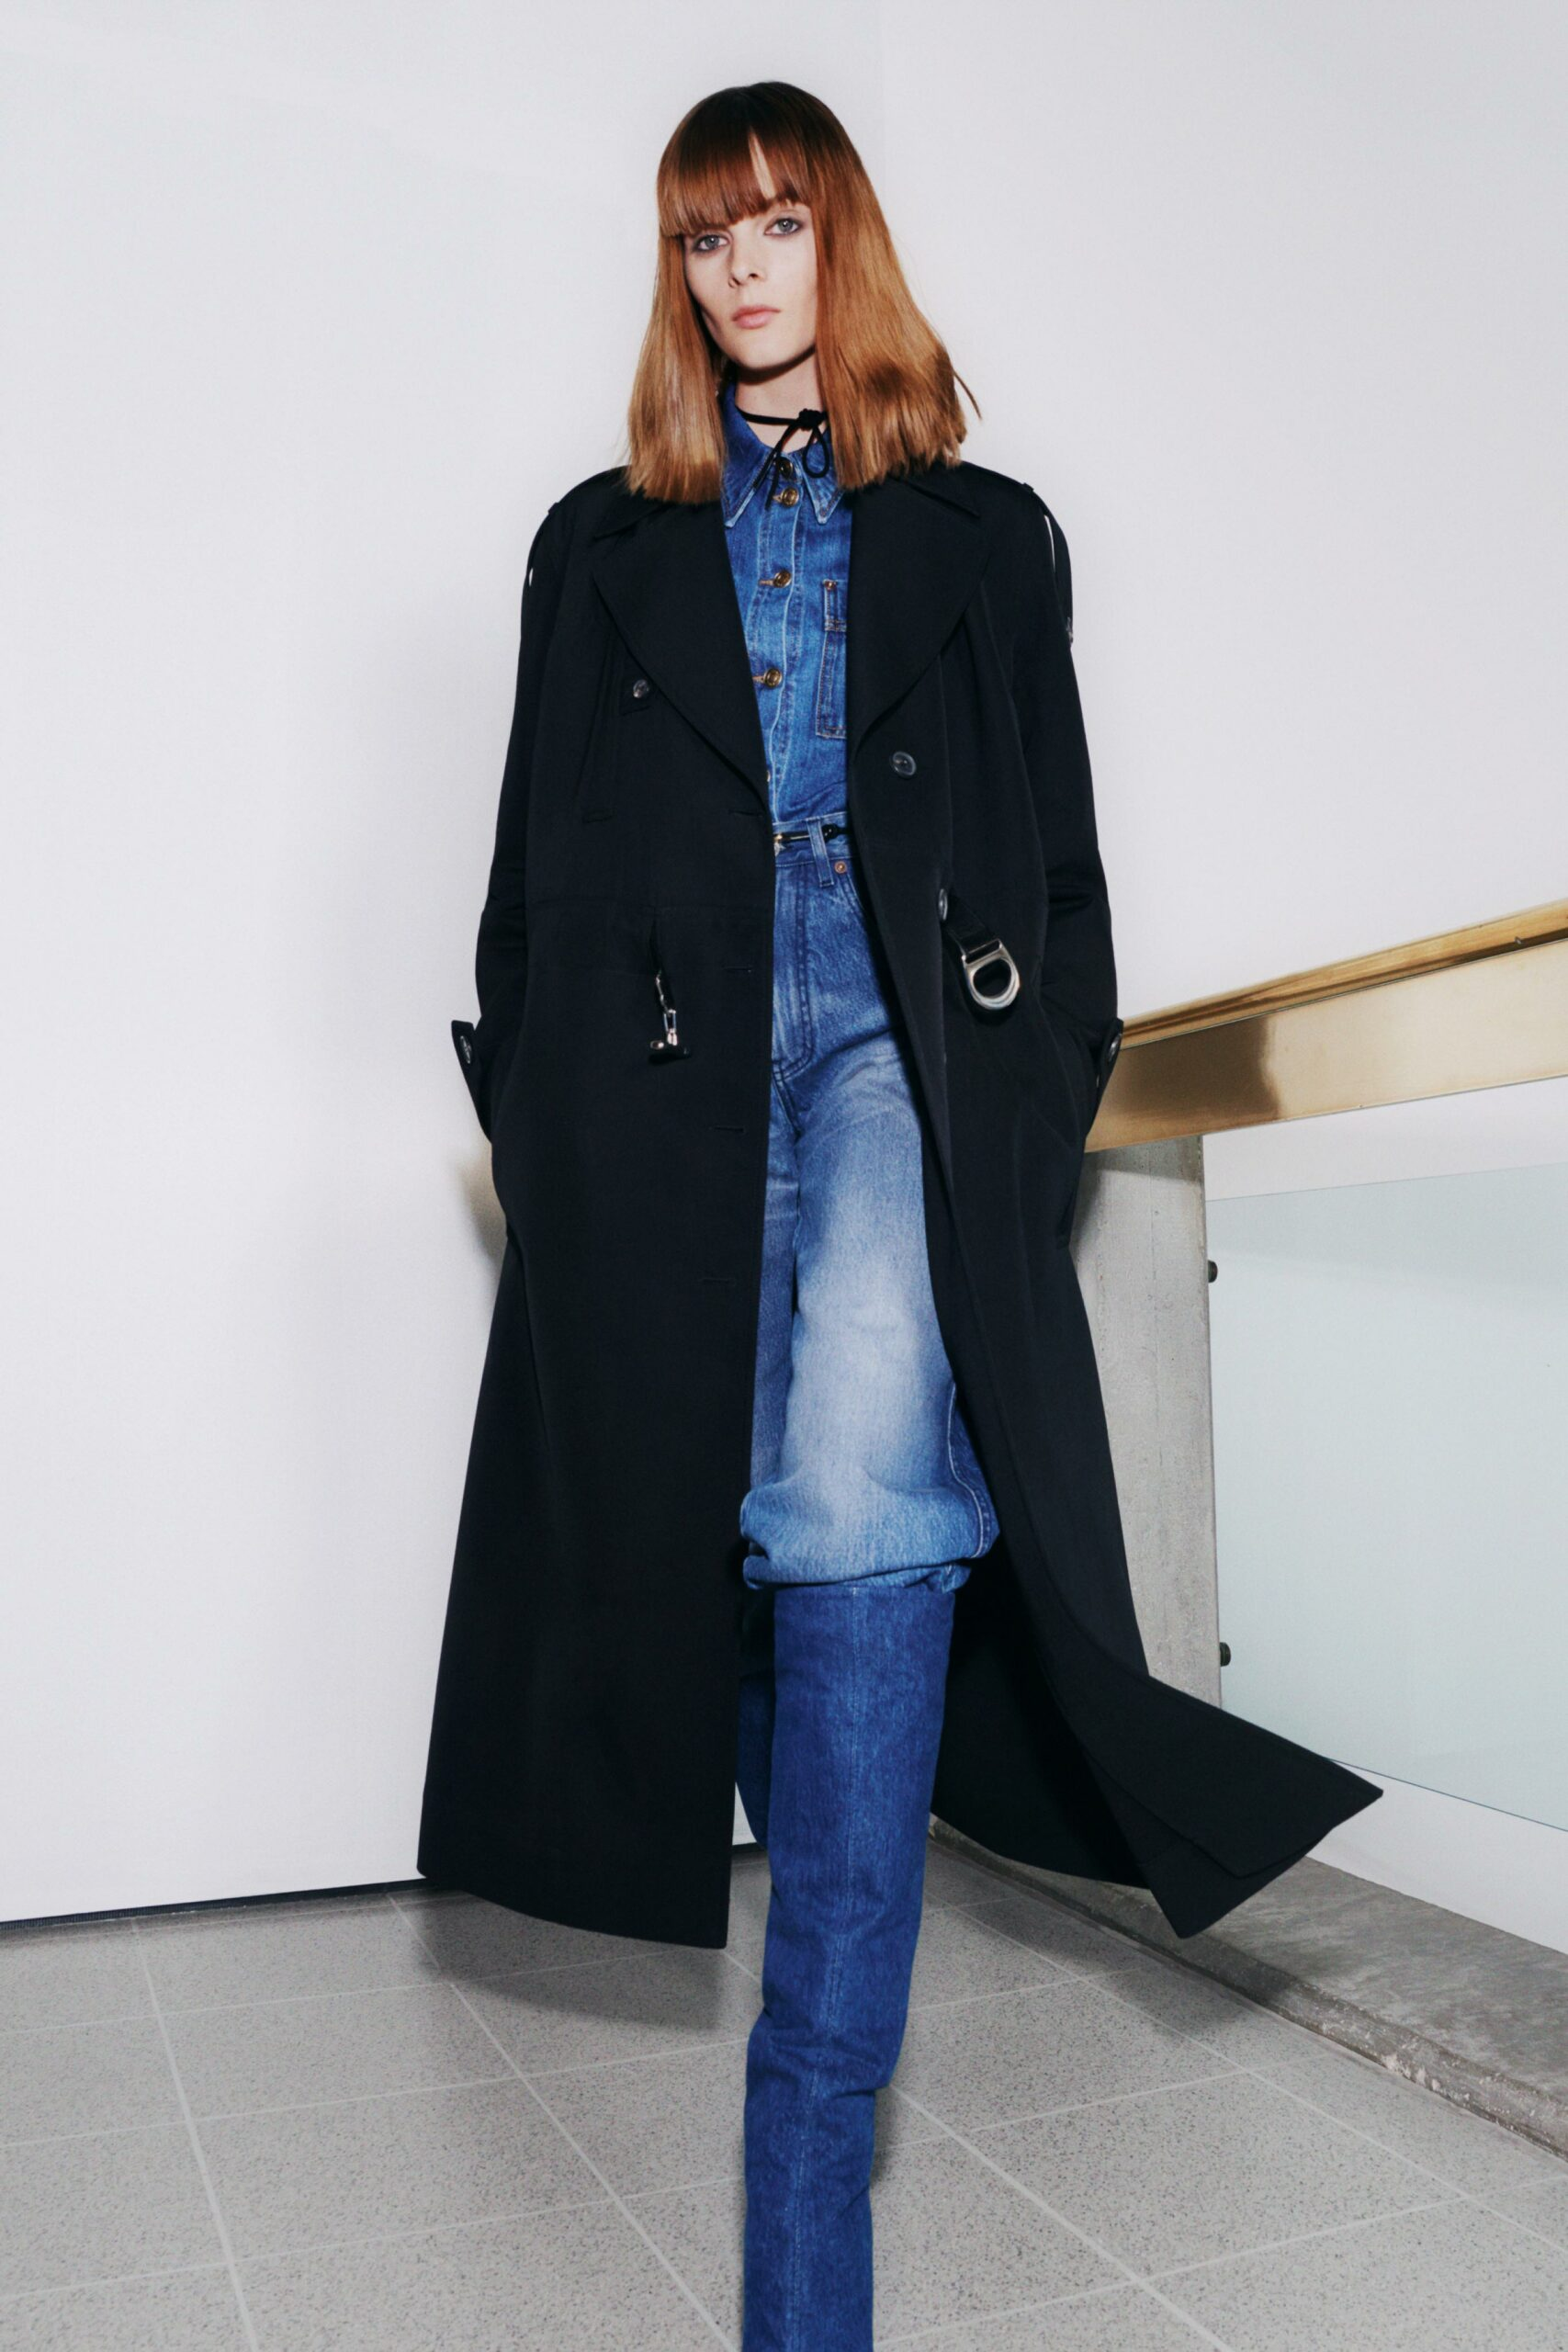 Styling tips: Αυτοί είναι οι 4+1 νέοι τρόποι για να φορέσεις το αγαπημένο σου τζιν το φθινόπωρο